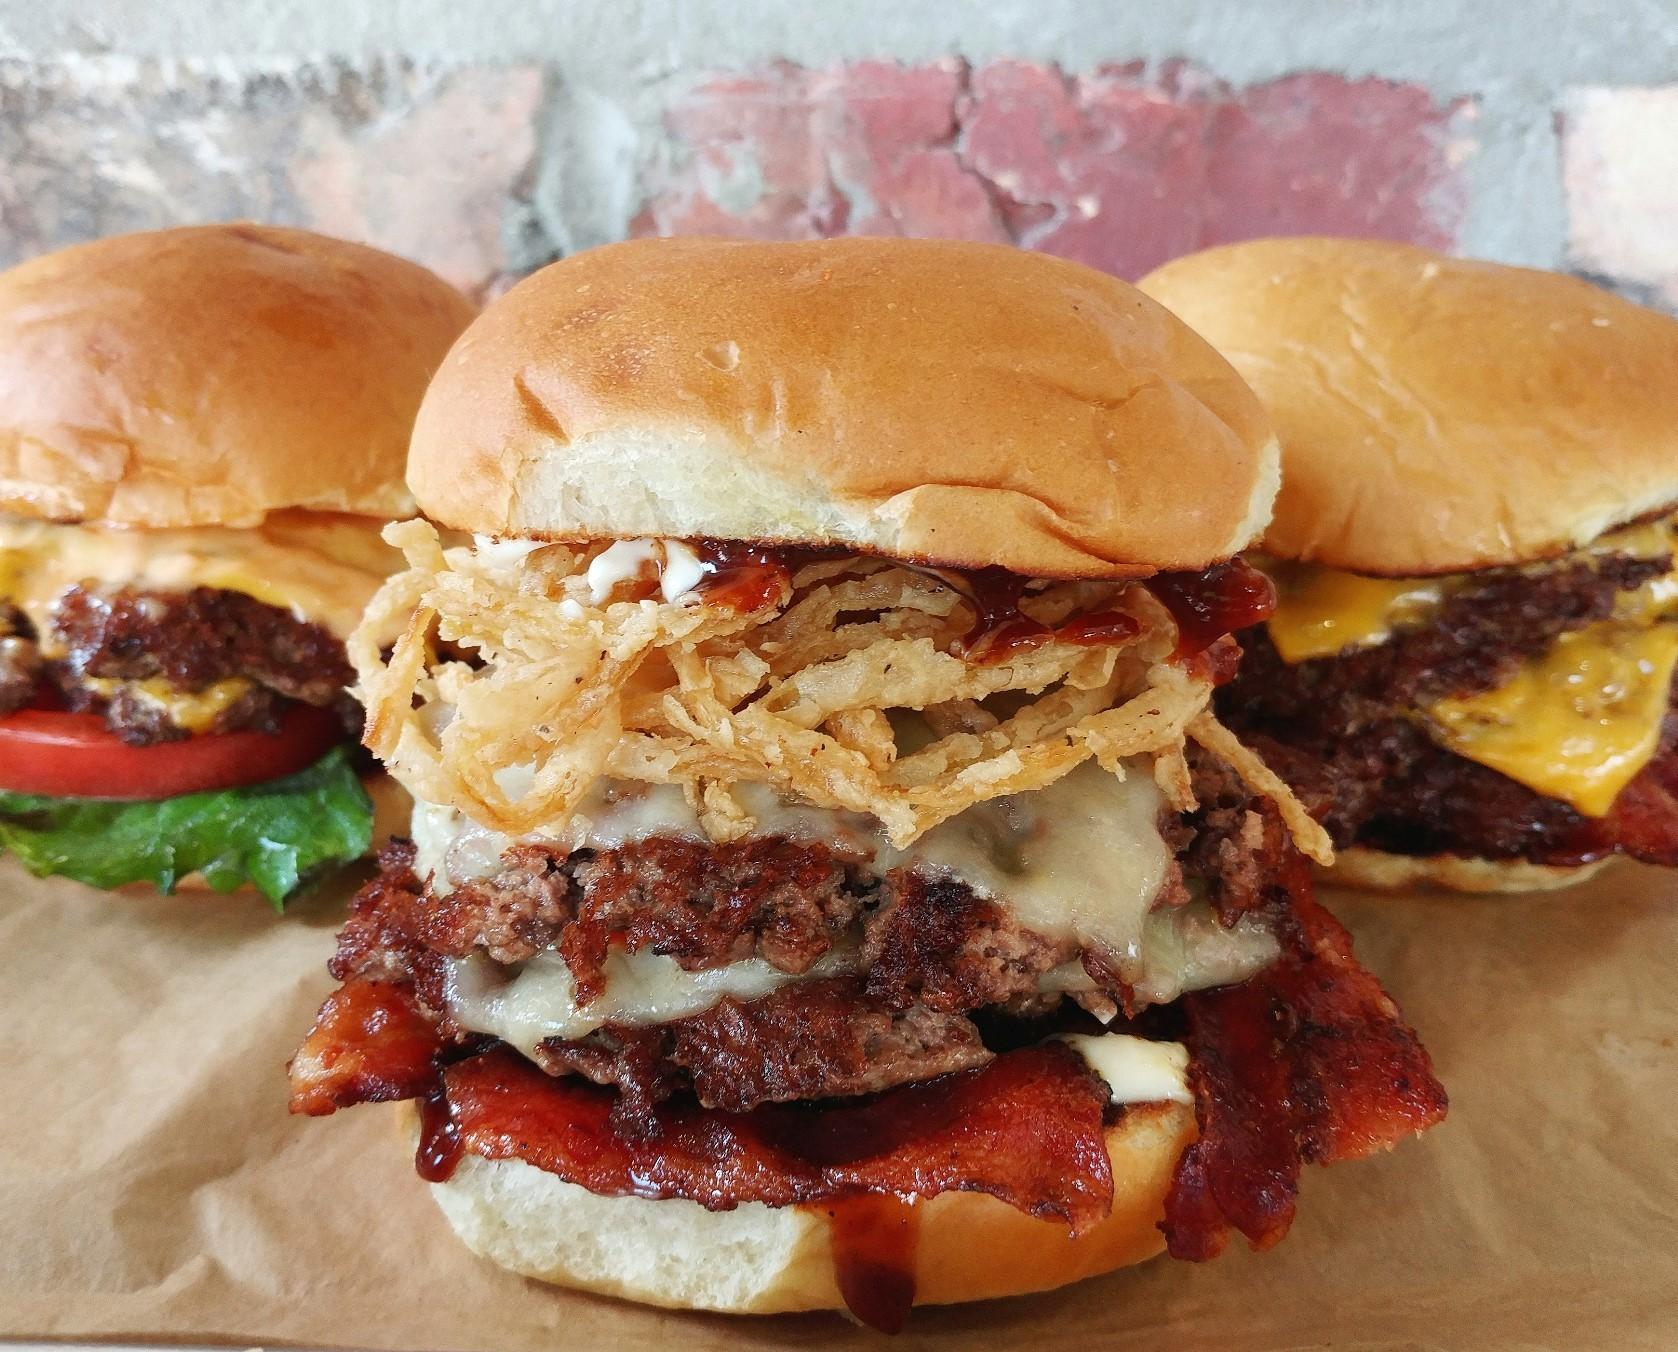 Burger Restaurants in Birmingham AL - MOOYAH Burgers, Fries and Shakes